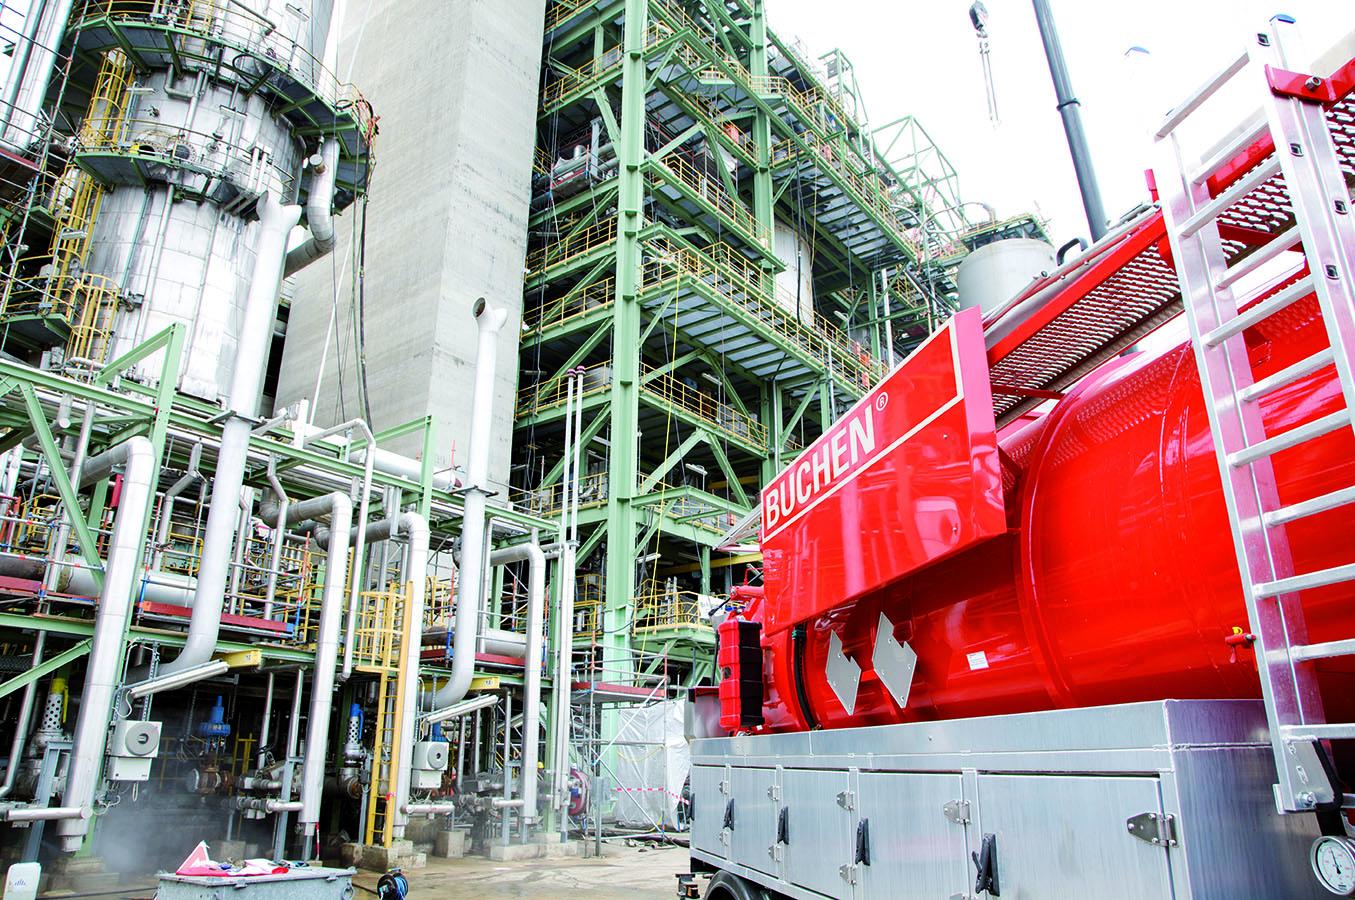 BUCHEN ESMAN Endüstriyel Servis Limited Şirketi